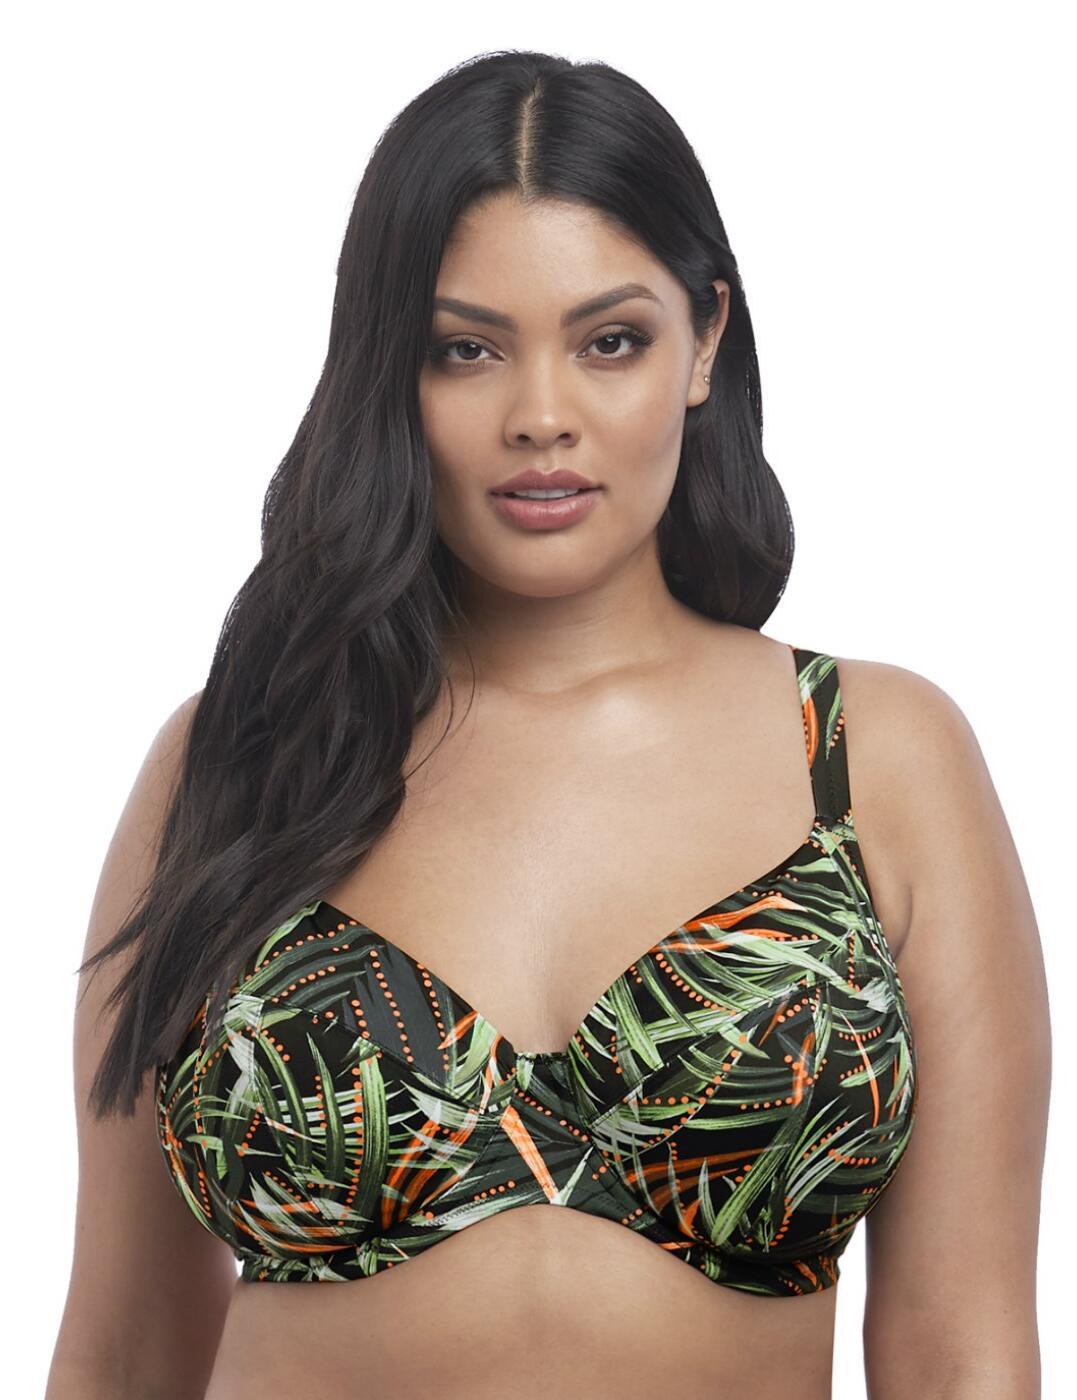 7162 Elomi Amazonia Underwired Plunge Bikini Top - 7162 Khaki